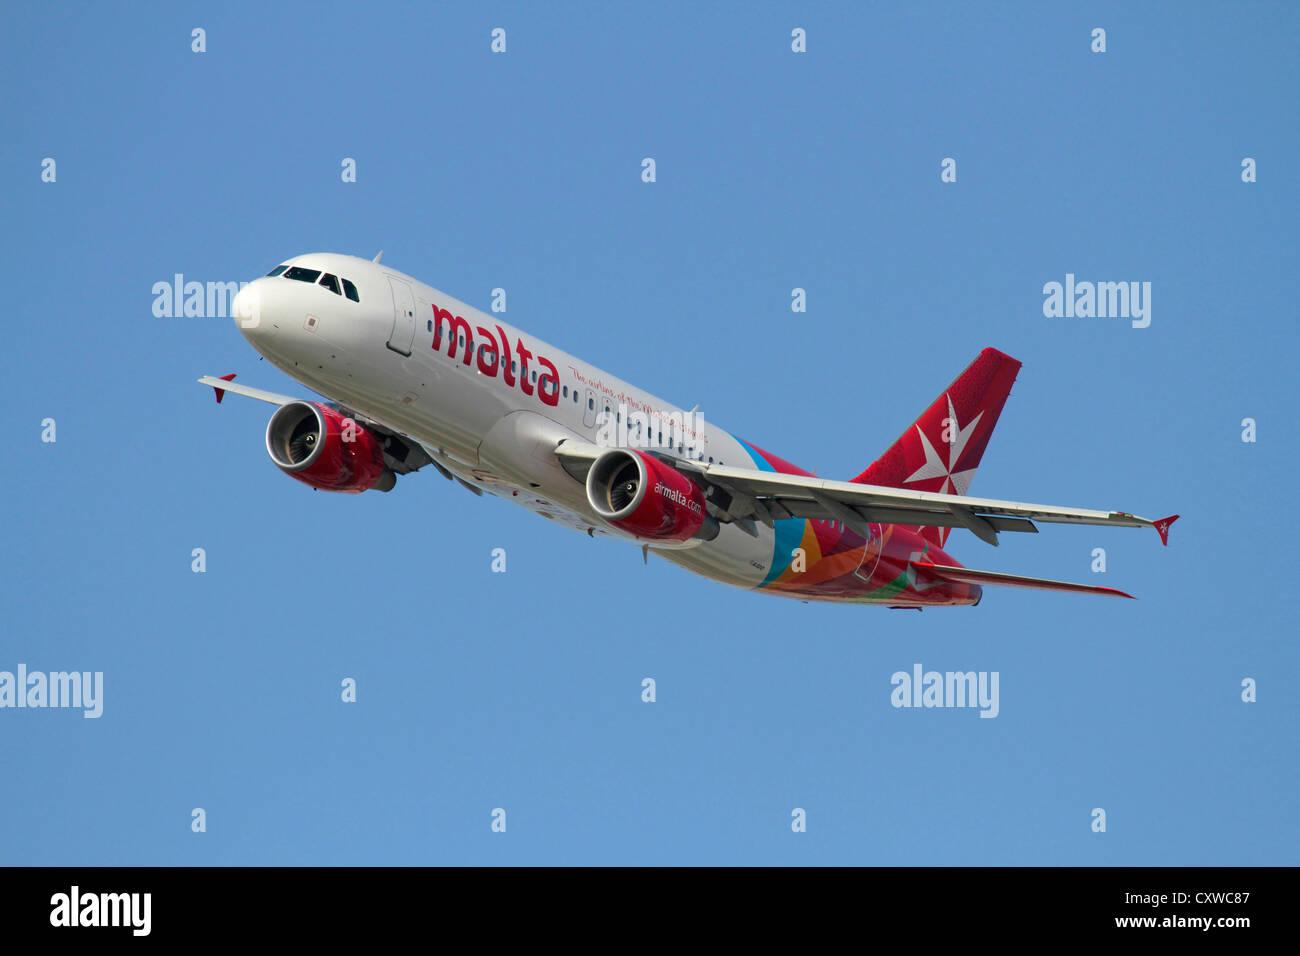 Airbus A320 de Air Malta avión de pasajeros en vuelo Foto de stock